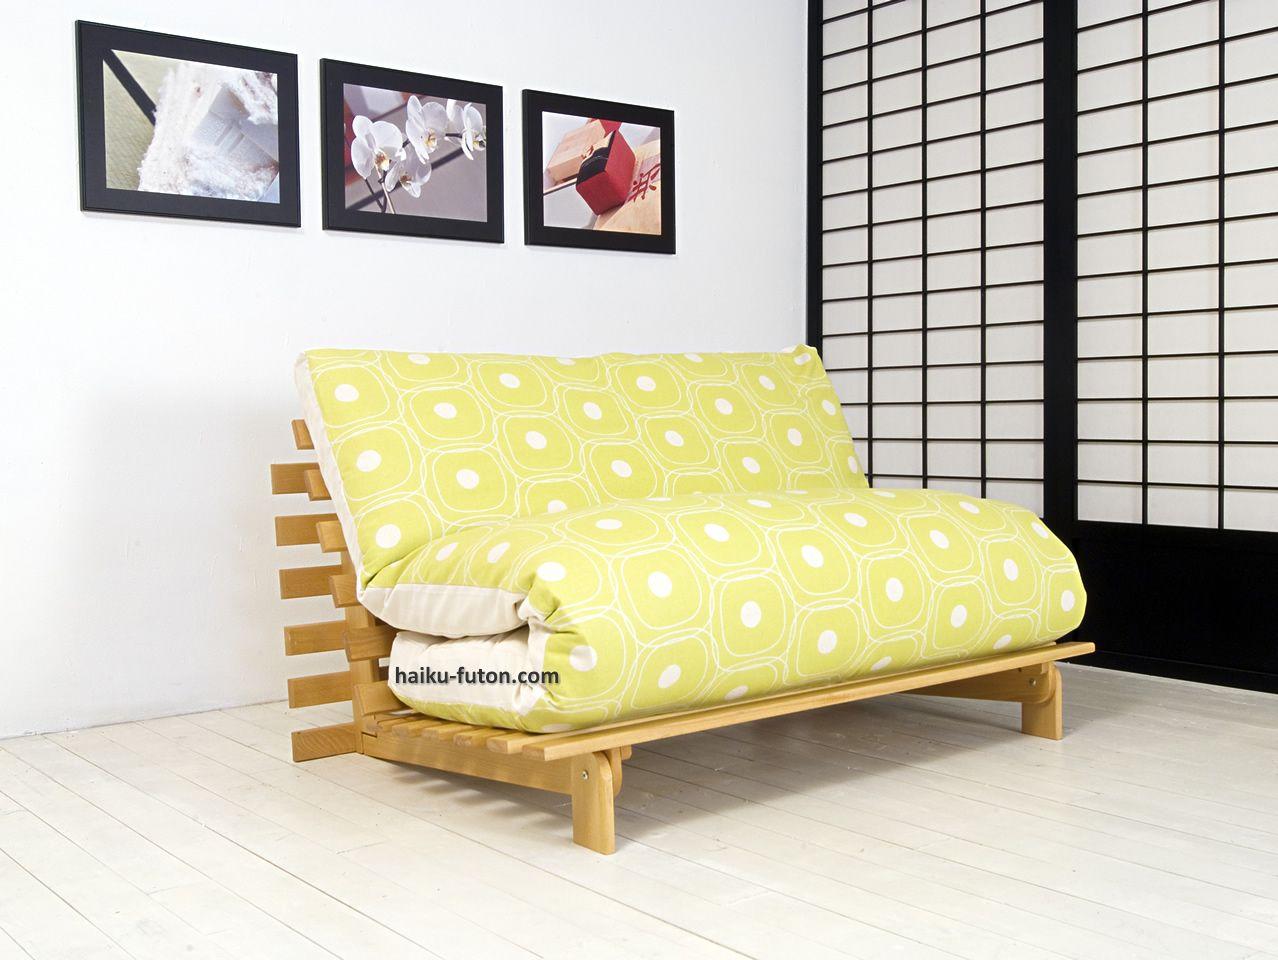 Futon sofá-cama Plegable La estructura del futon sofá-cama Plegables ...